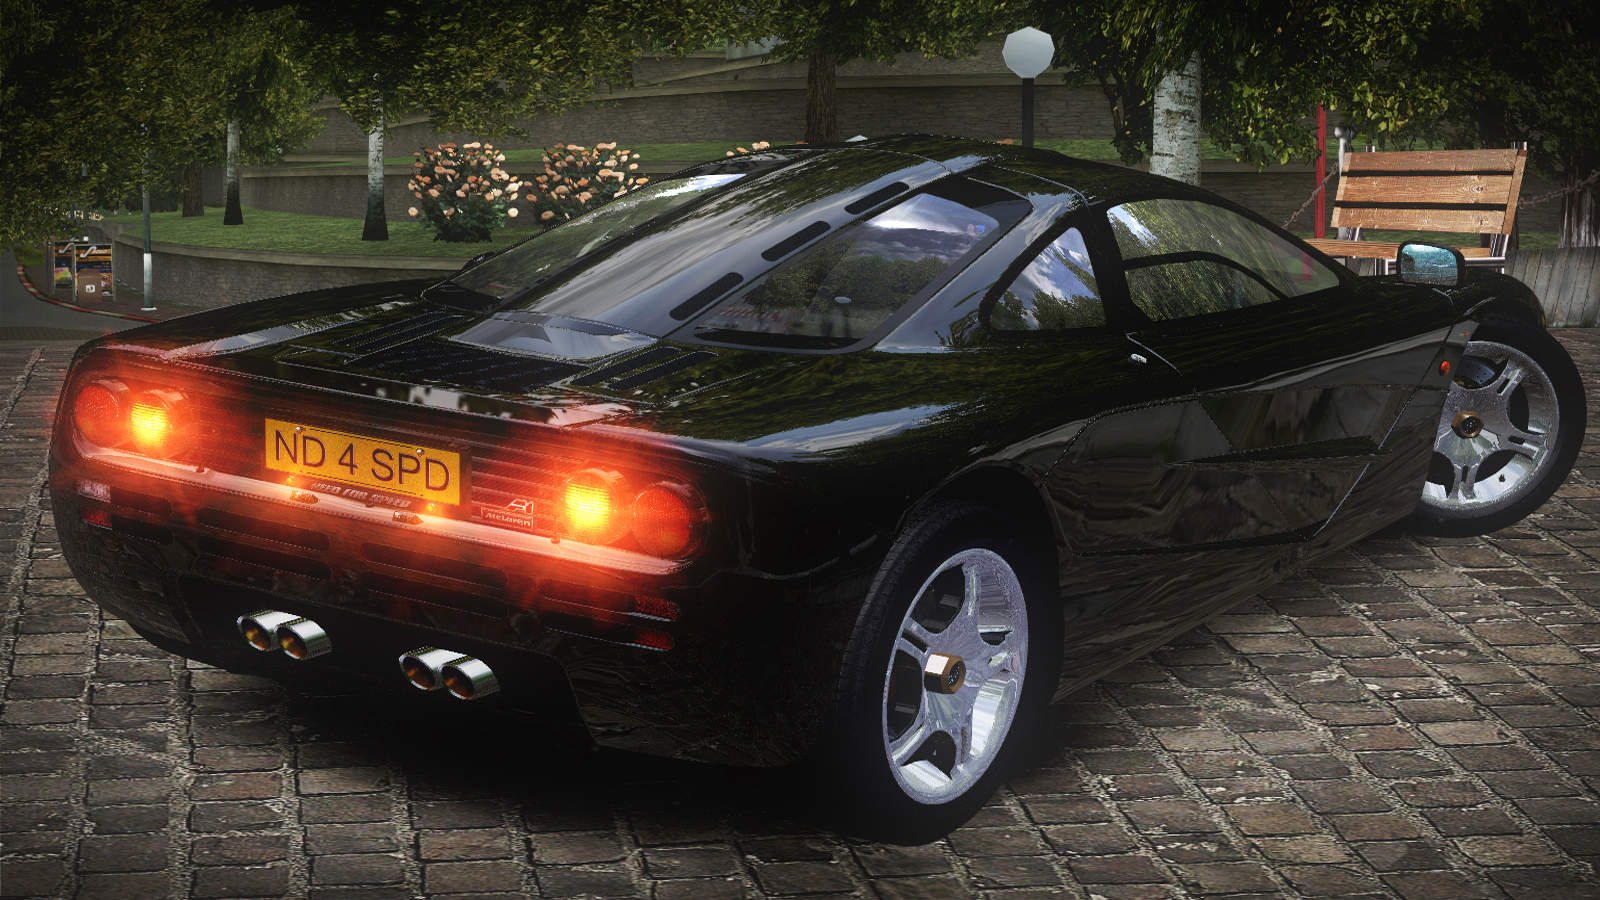 McLaren F1 NFS2 Edition by Alex.Ka. - Need for Speed: Most Wanted (2005) mclaren f1, Автомобиль